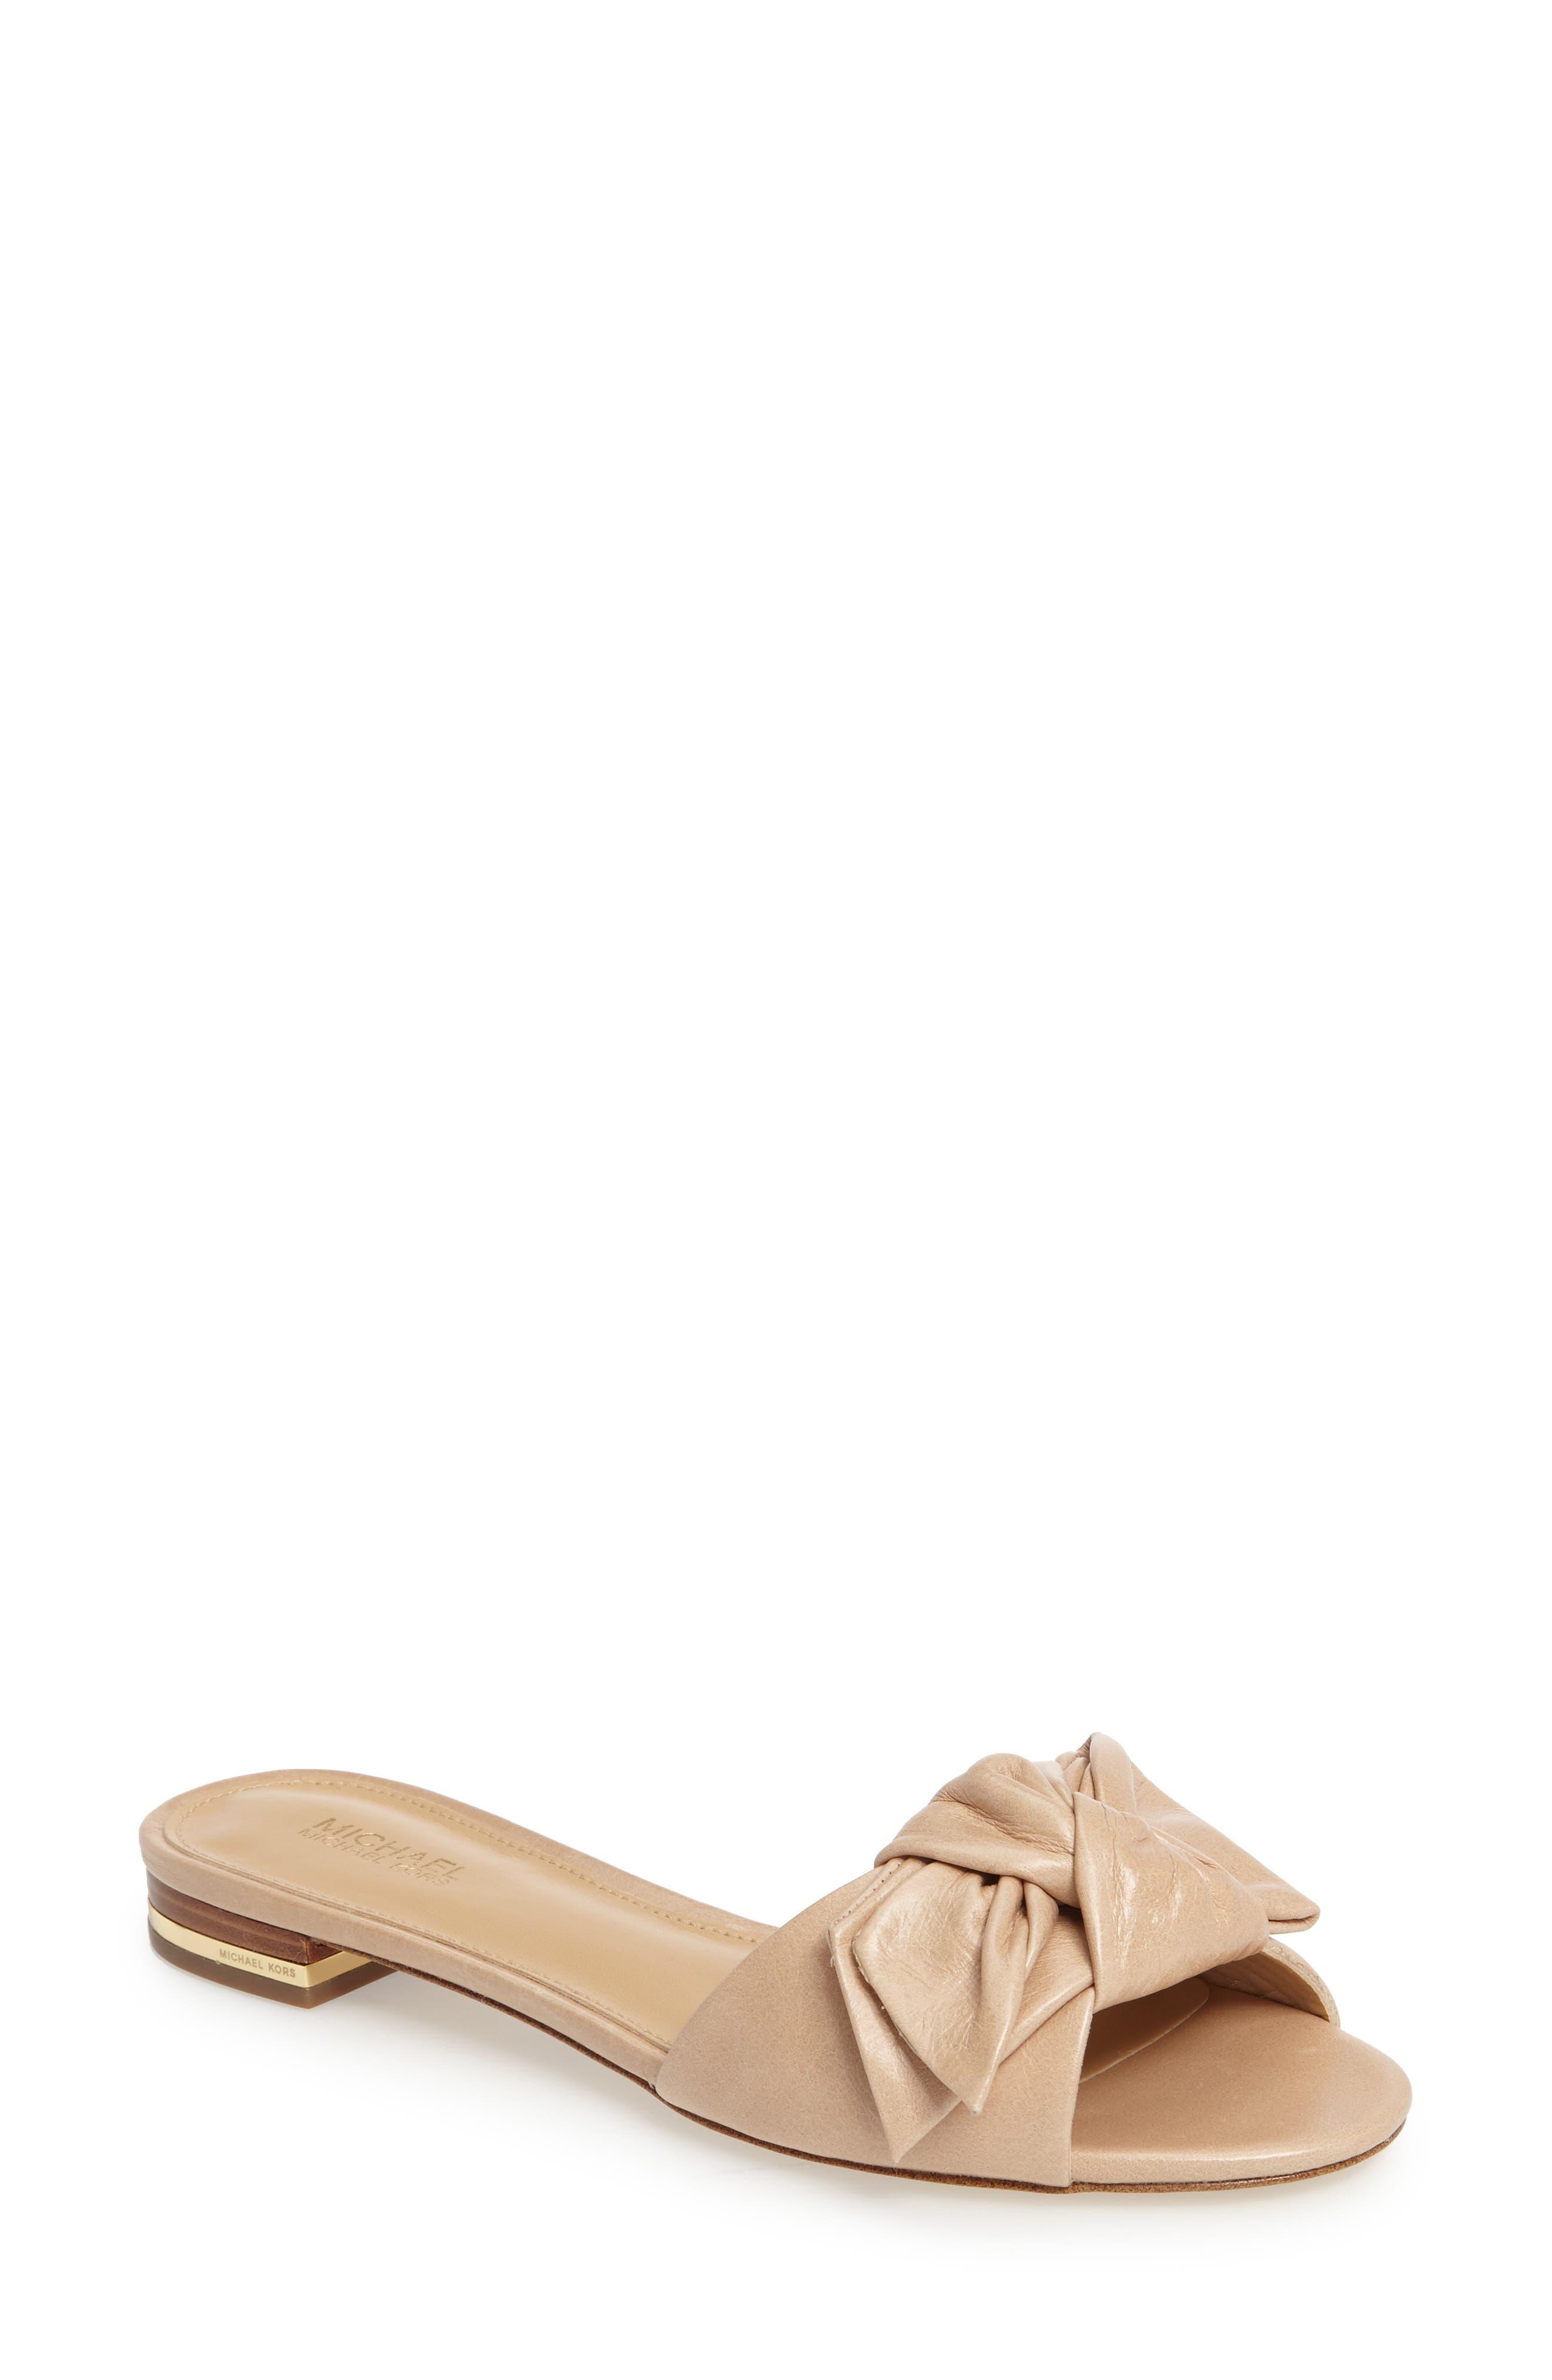 Willa Slide Sandal, Main, color, 250